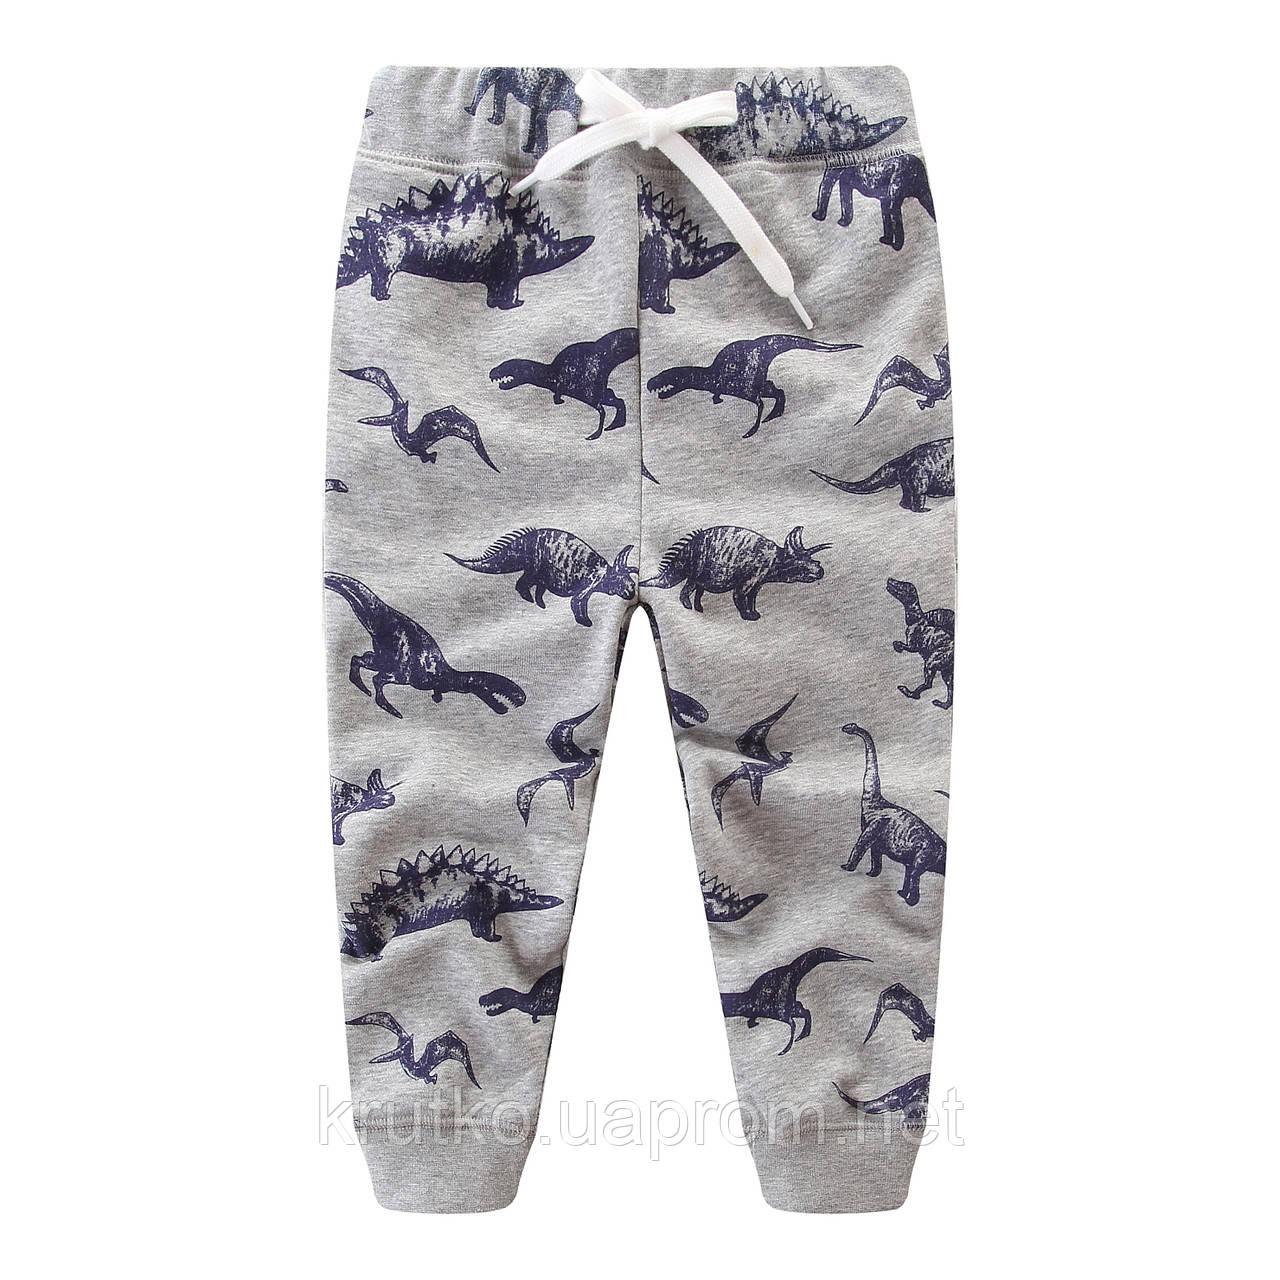 Штаны для мальчика Динозавры Jumping Meters